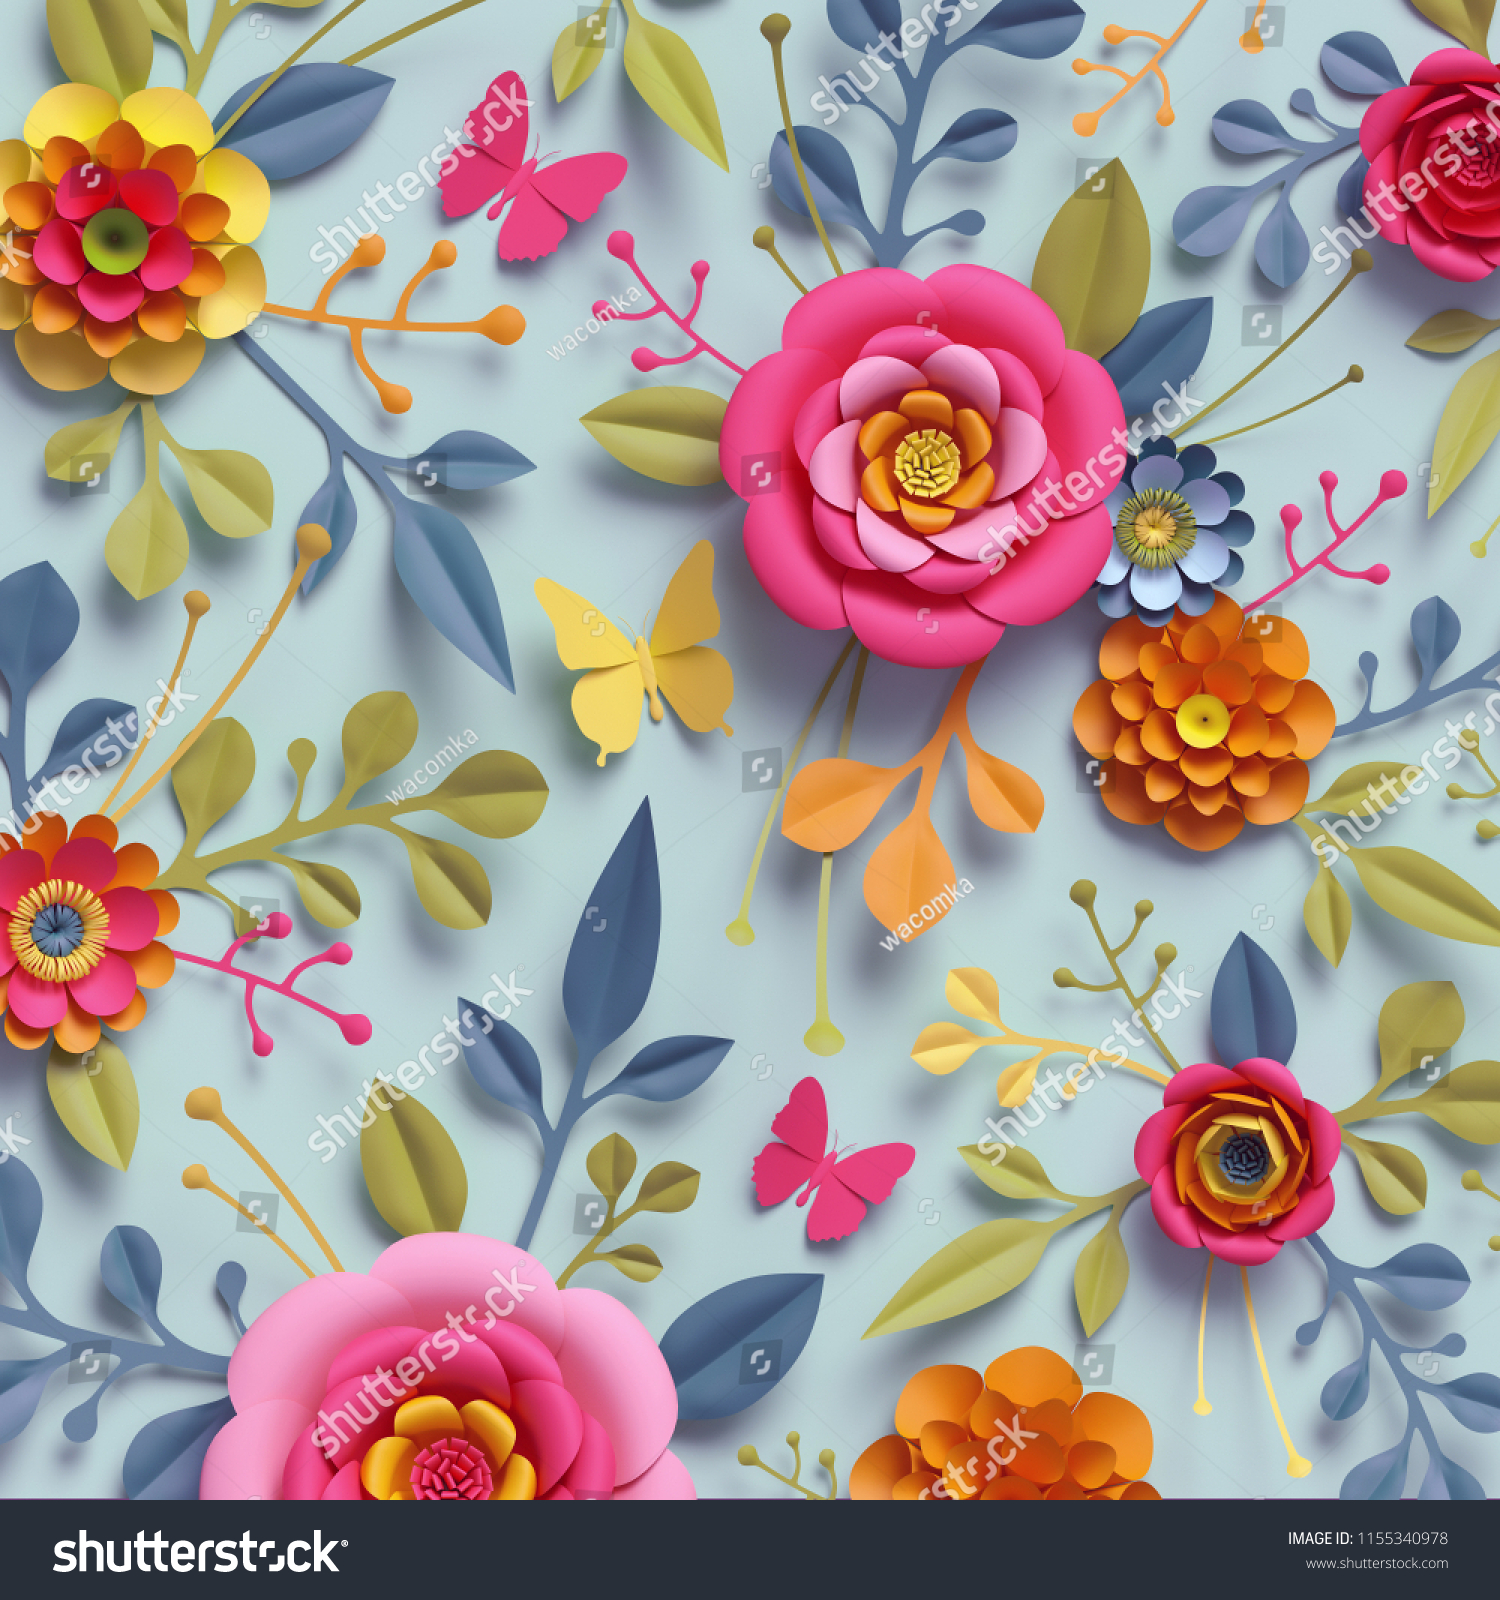 3 d render craft paper flowers fall stock illustration 1155340978 3d render craft paper flowers fall botanical wallpaper thanksgiving floral bouquet bright izmirmasajfo